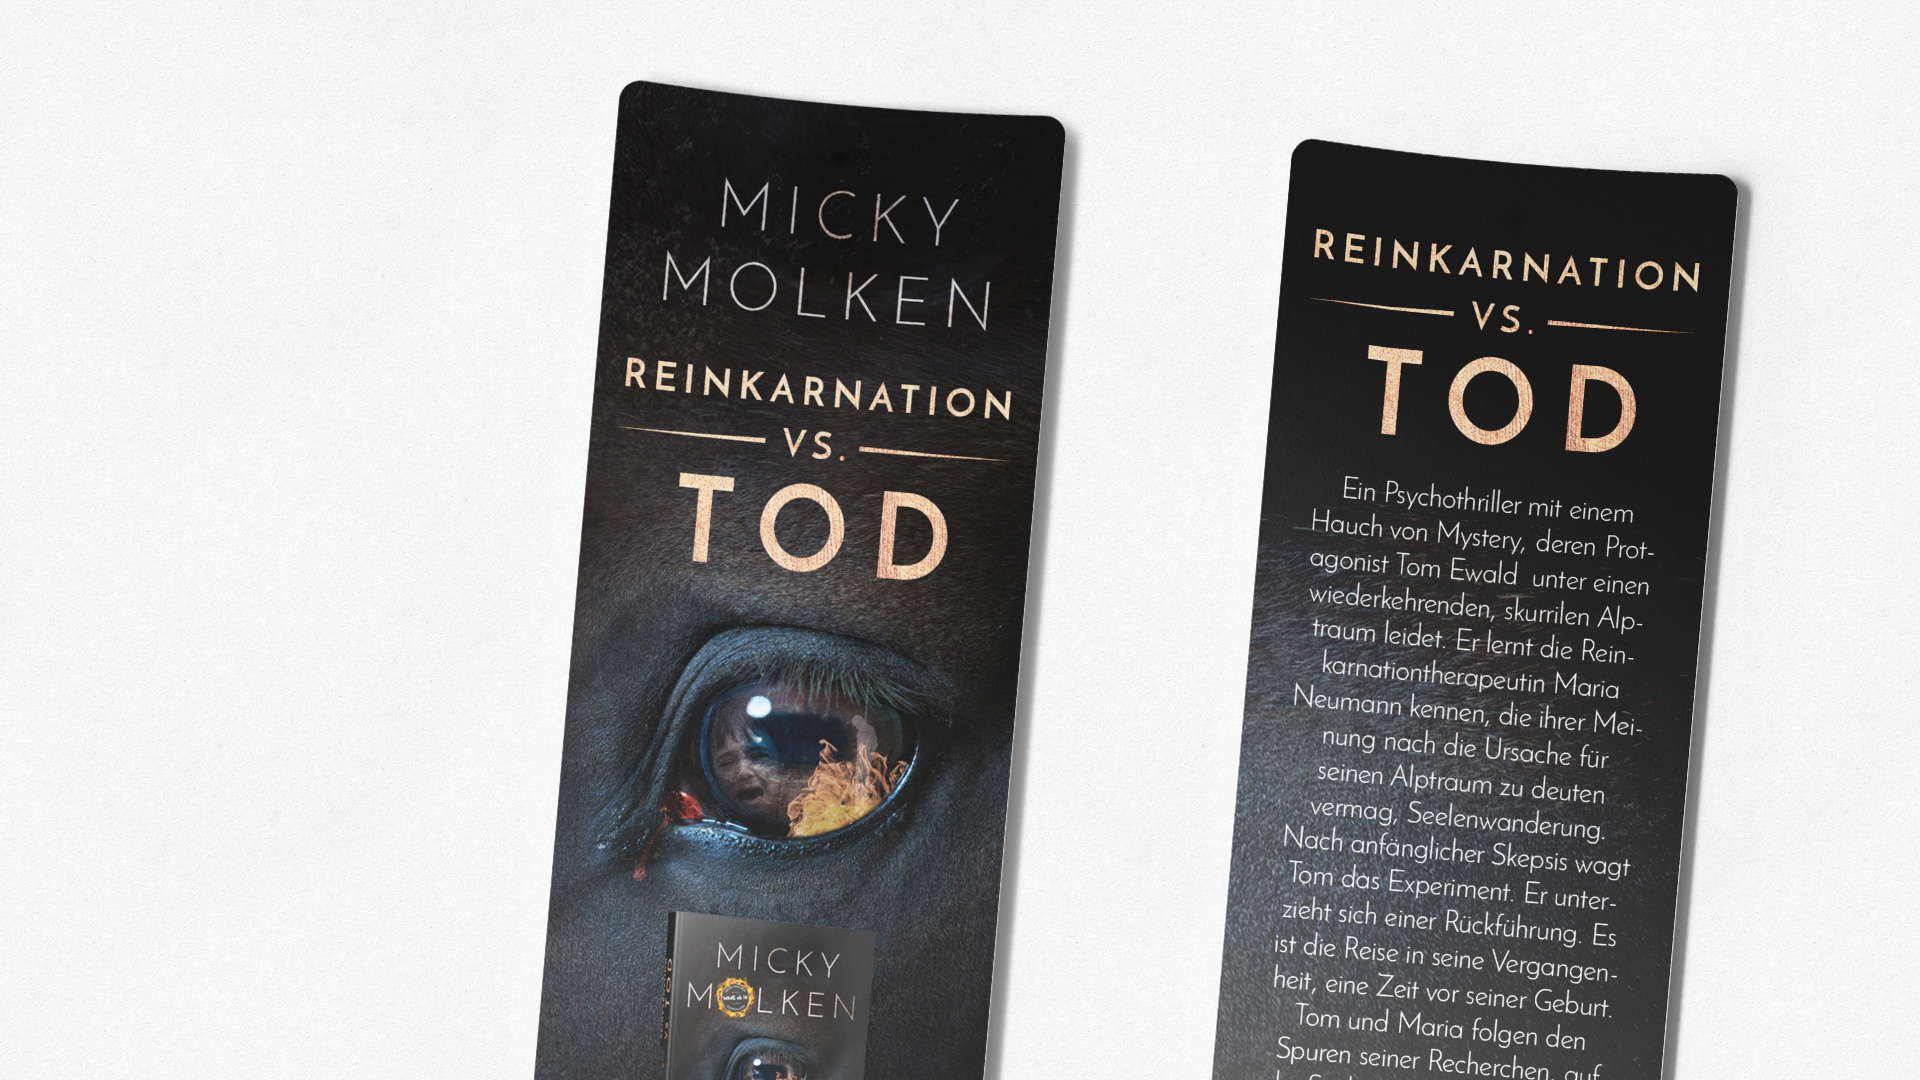 Reinkarnation vs. Tod Lesezeichen